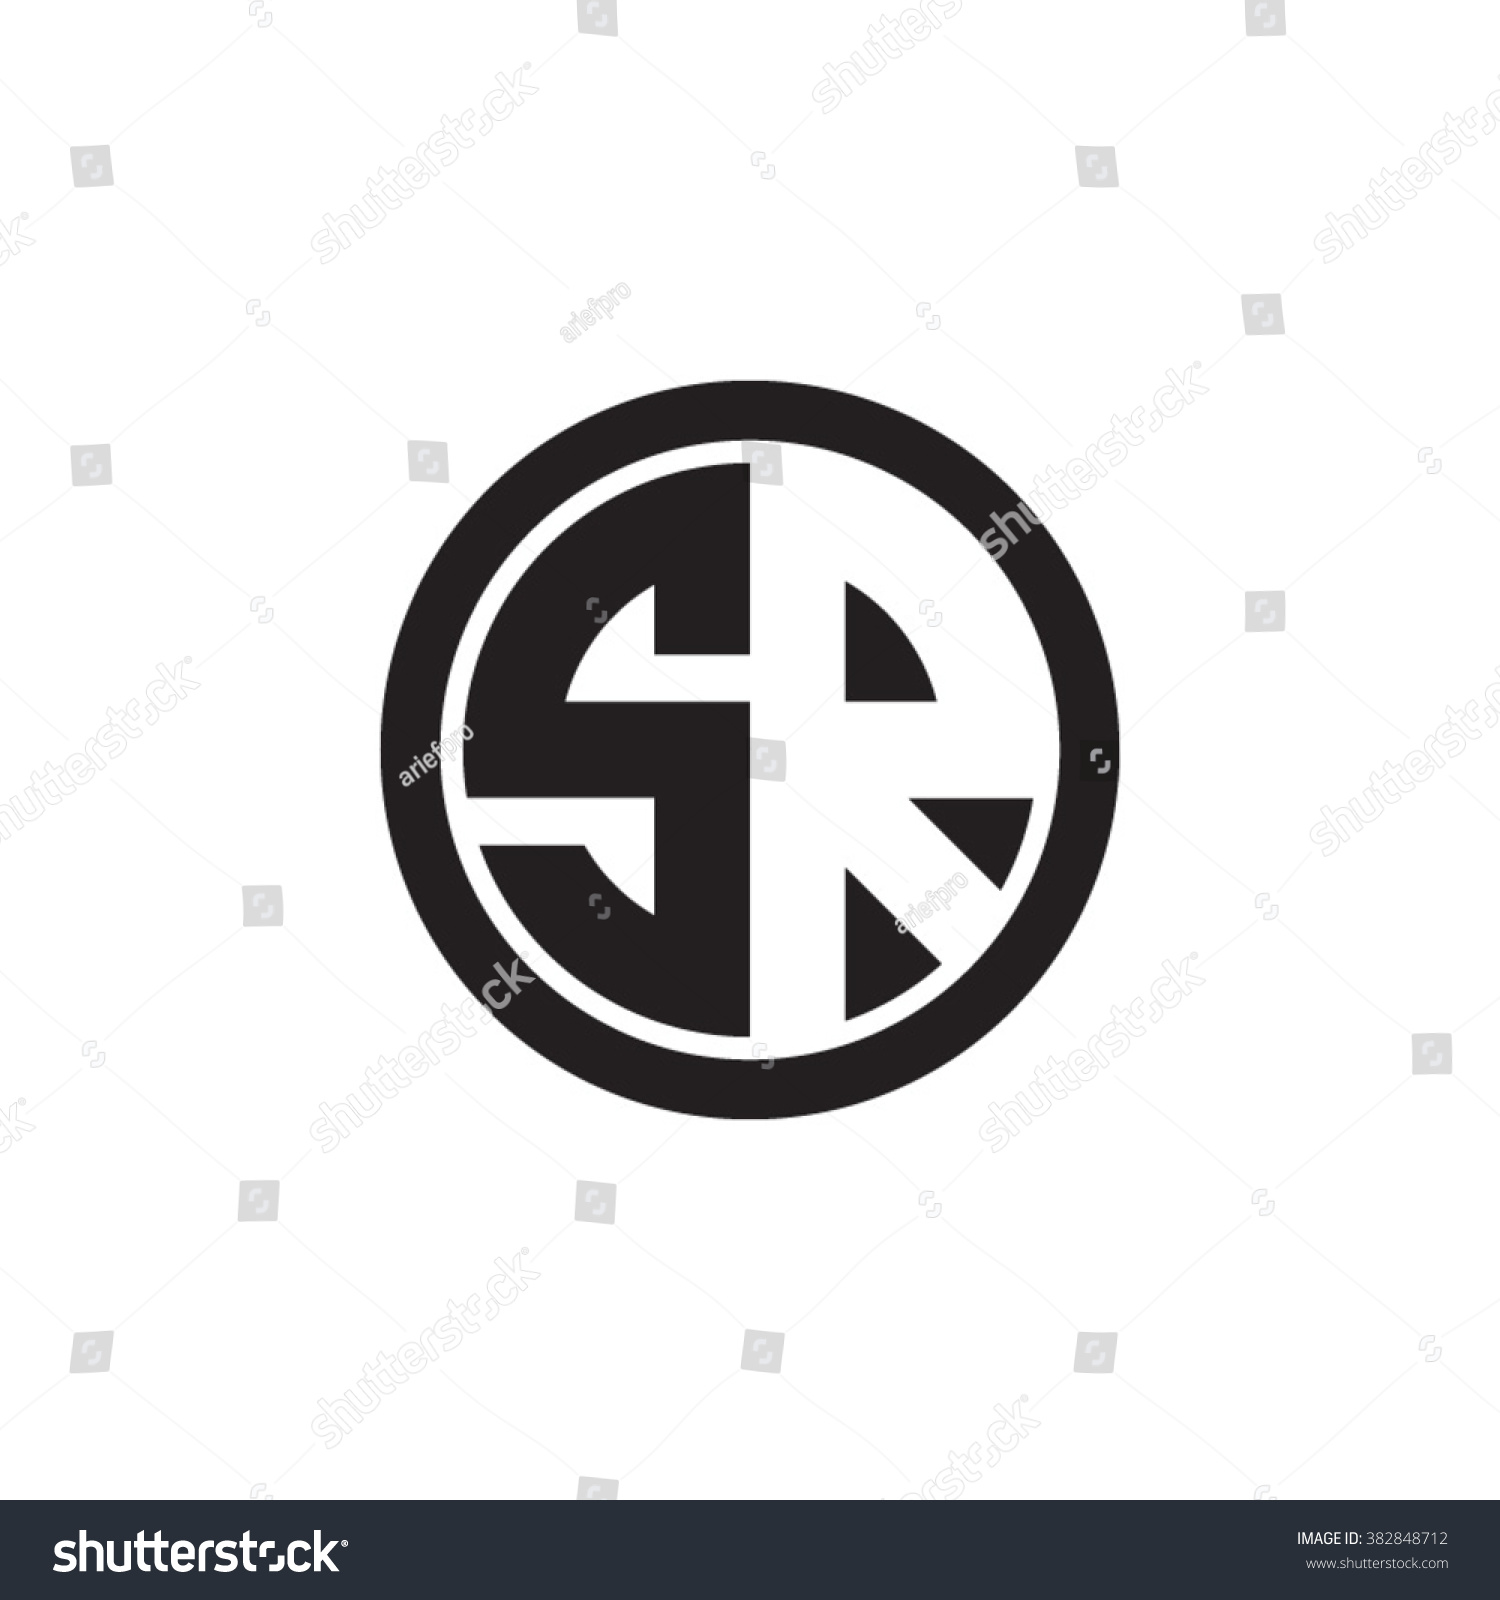 Sr Initial Letters Circle Monogram Logo Stock Vector Royalty Free 382848712